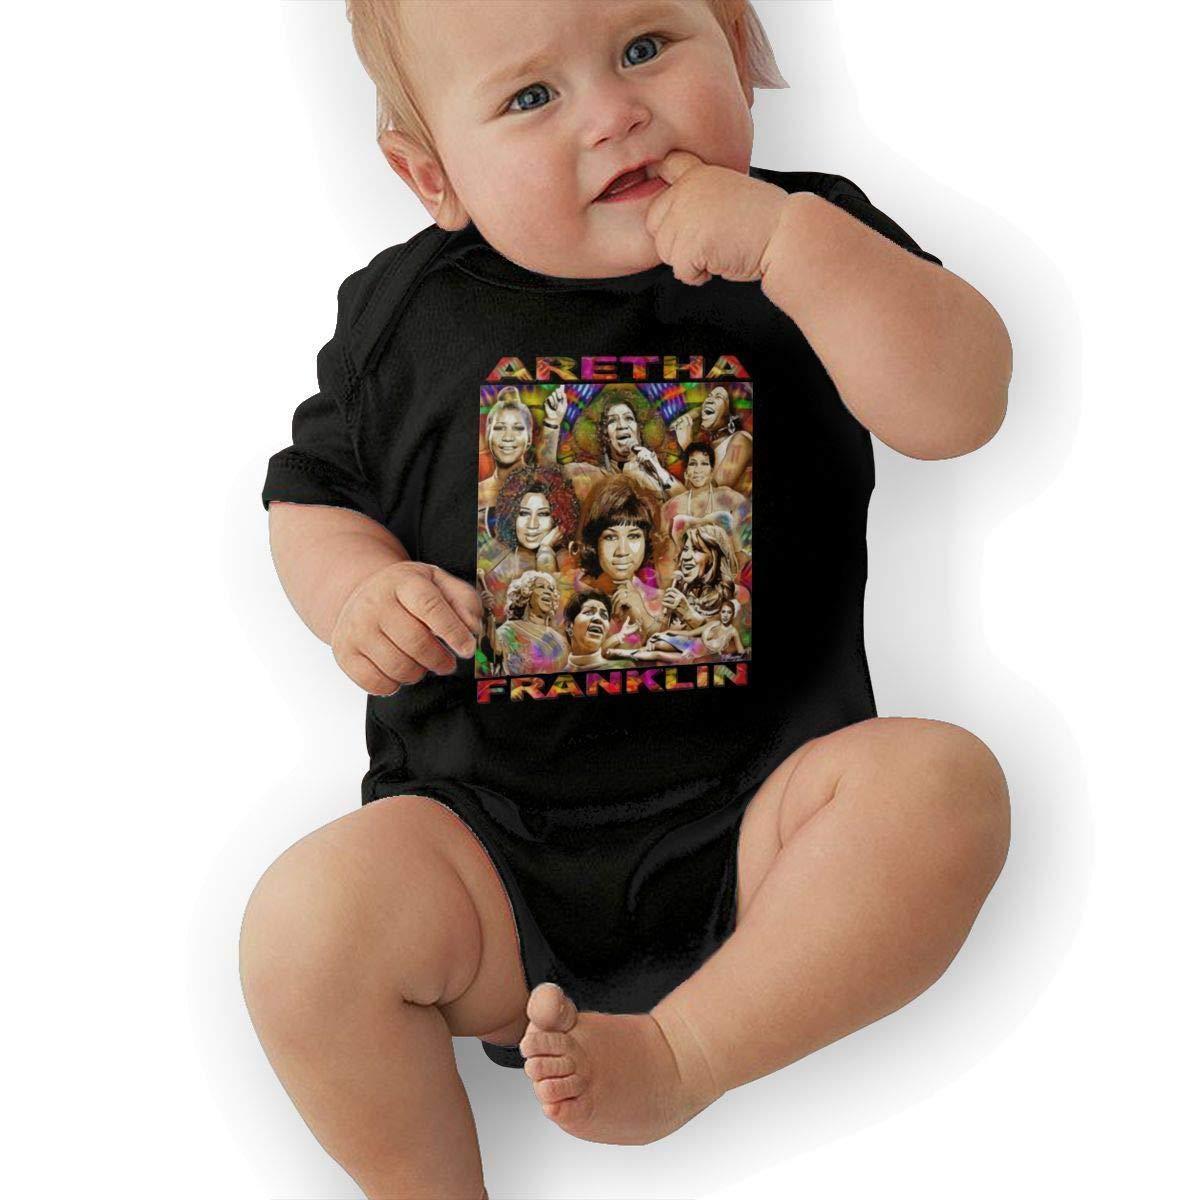 Infant Aretha Franklin Cute Soft Music Band Jersey Bodysuit,Black,6M